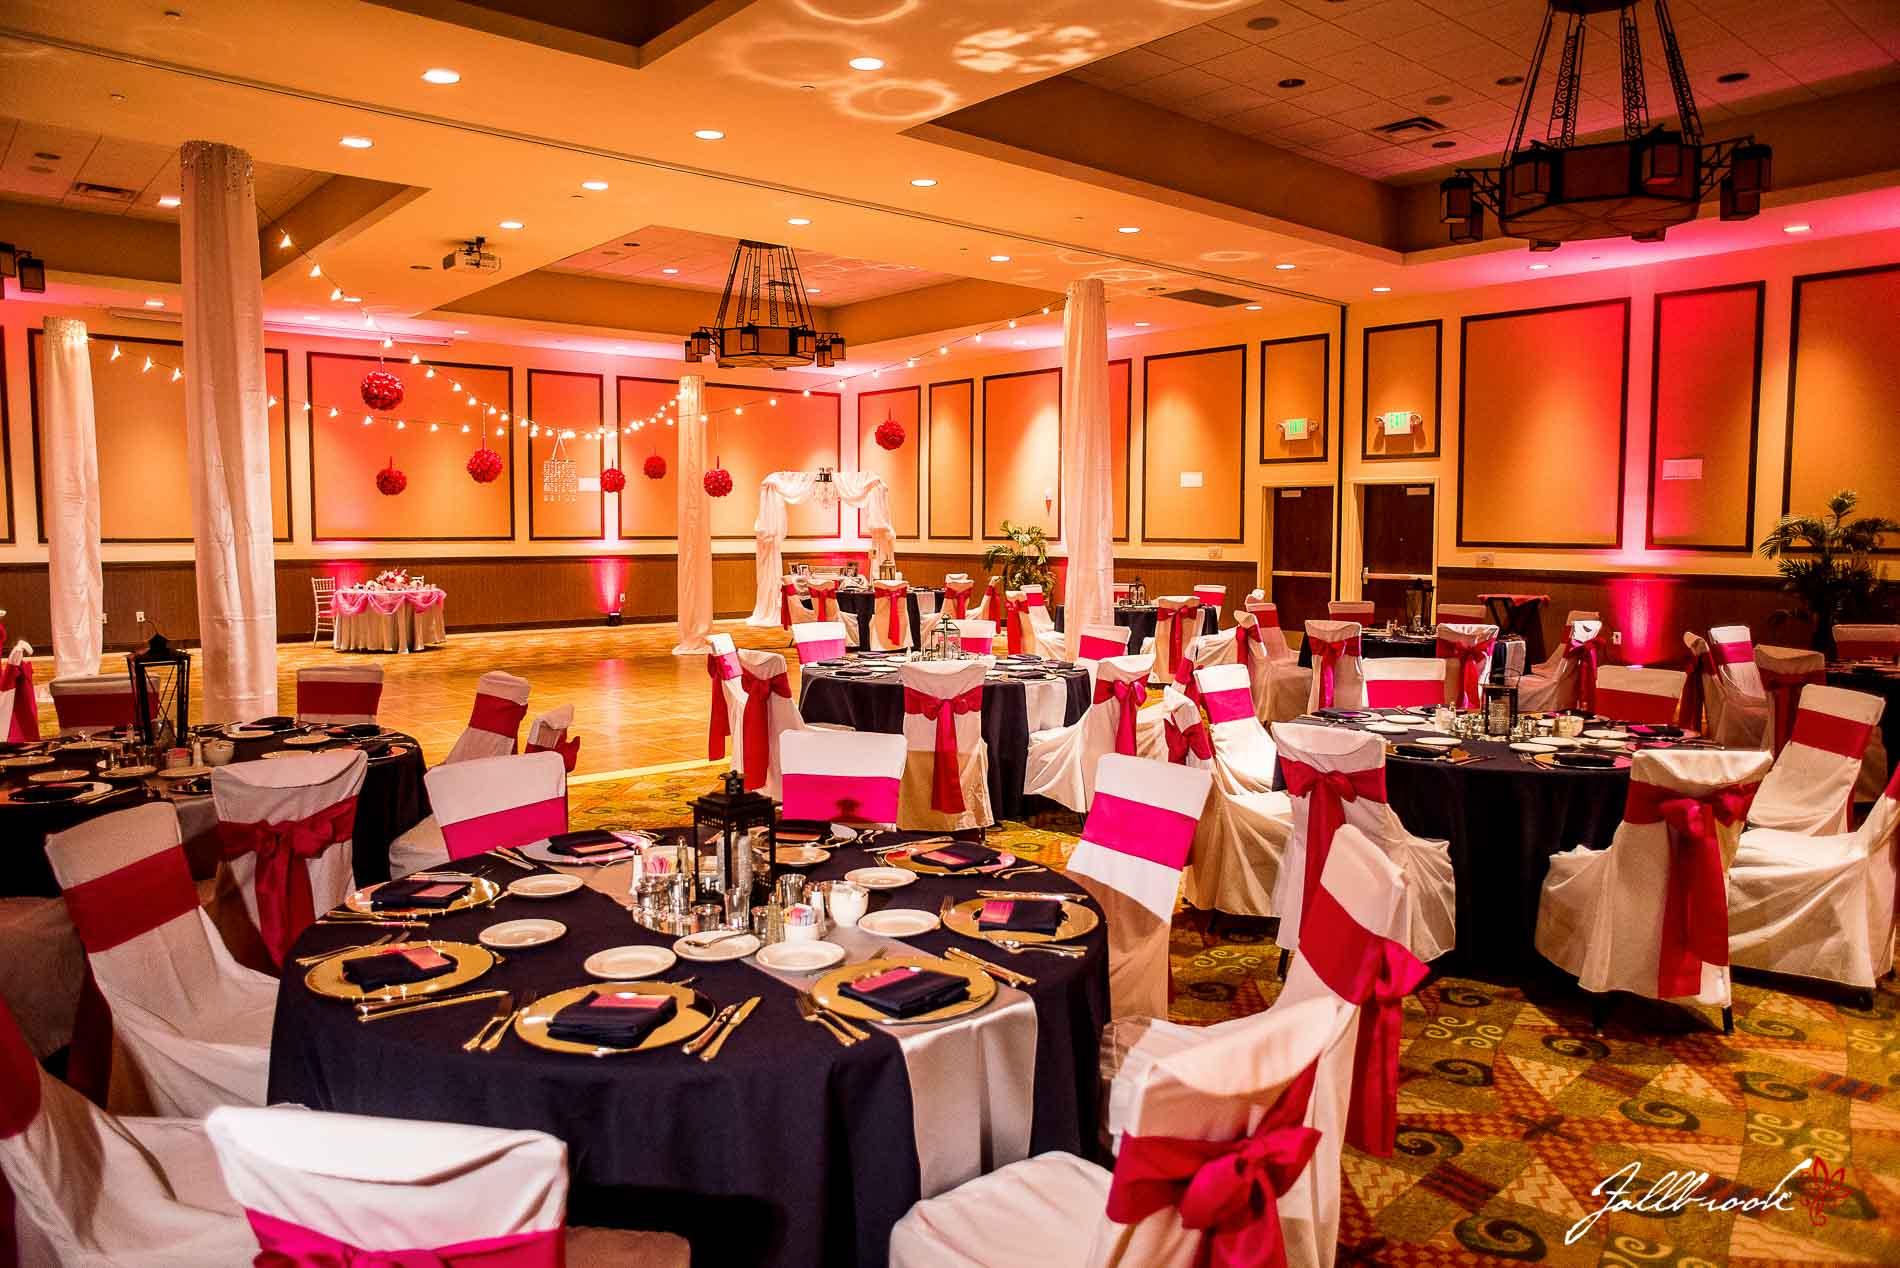 Wedding Of Jeff And Minda At The Hilton Garden Inn In Yuma, Arizona Idea